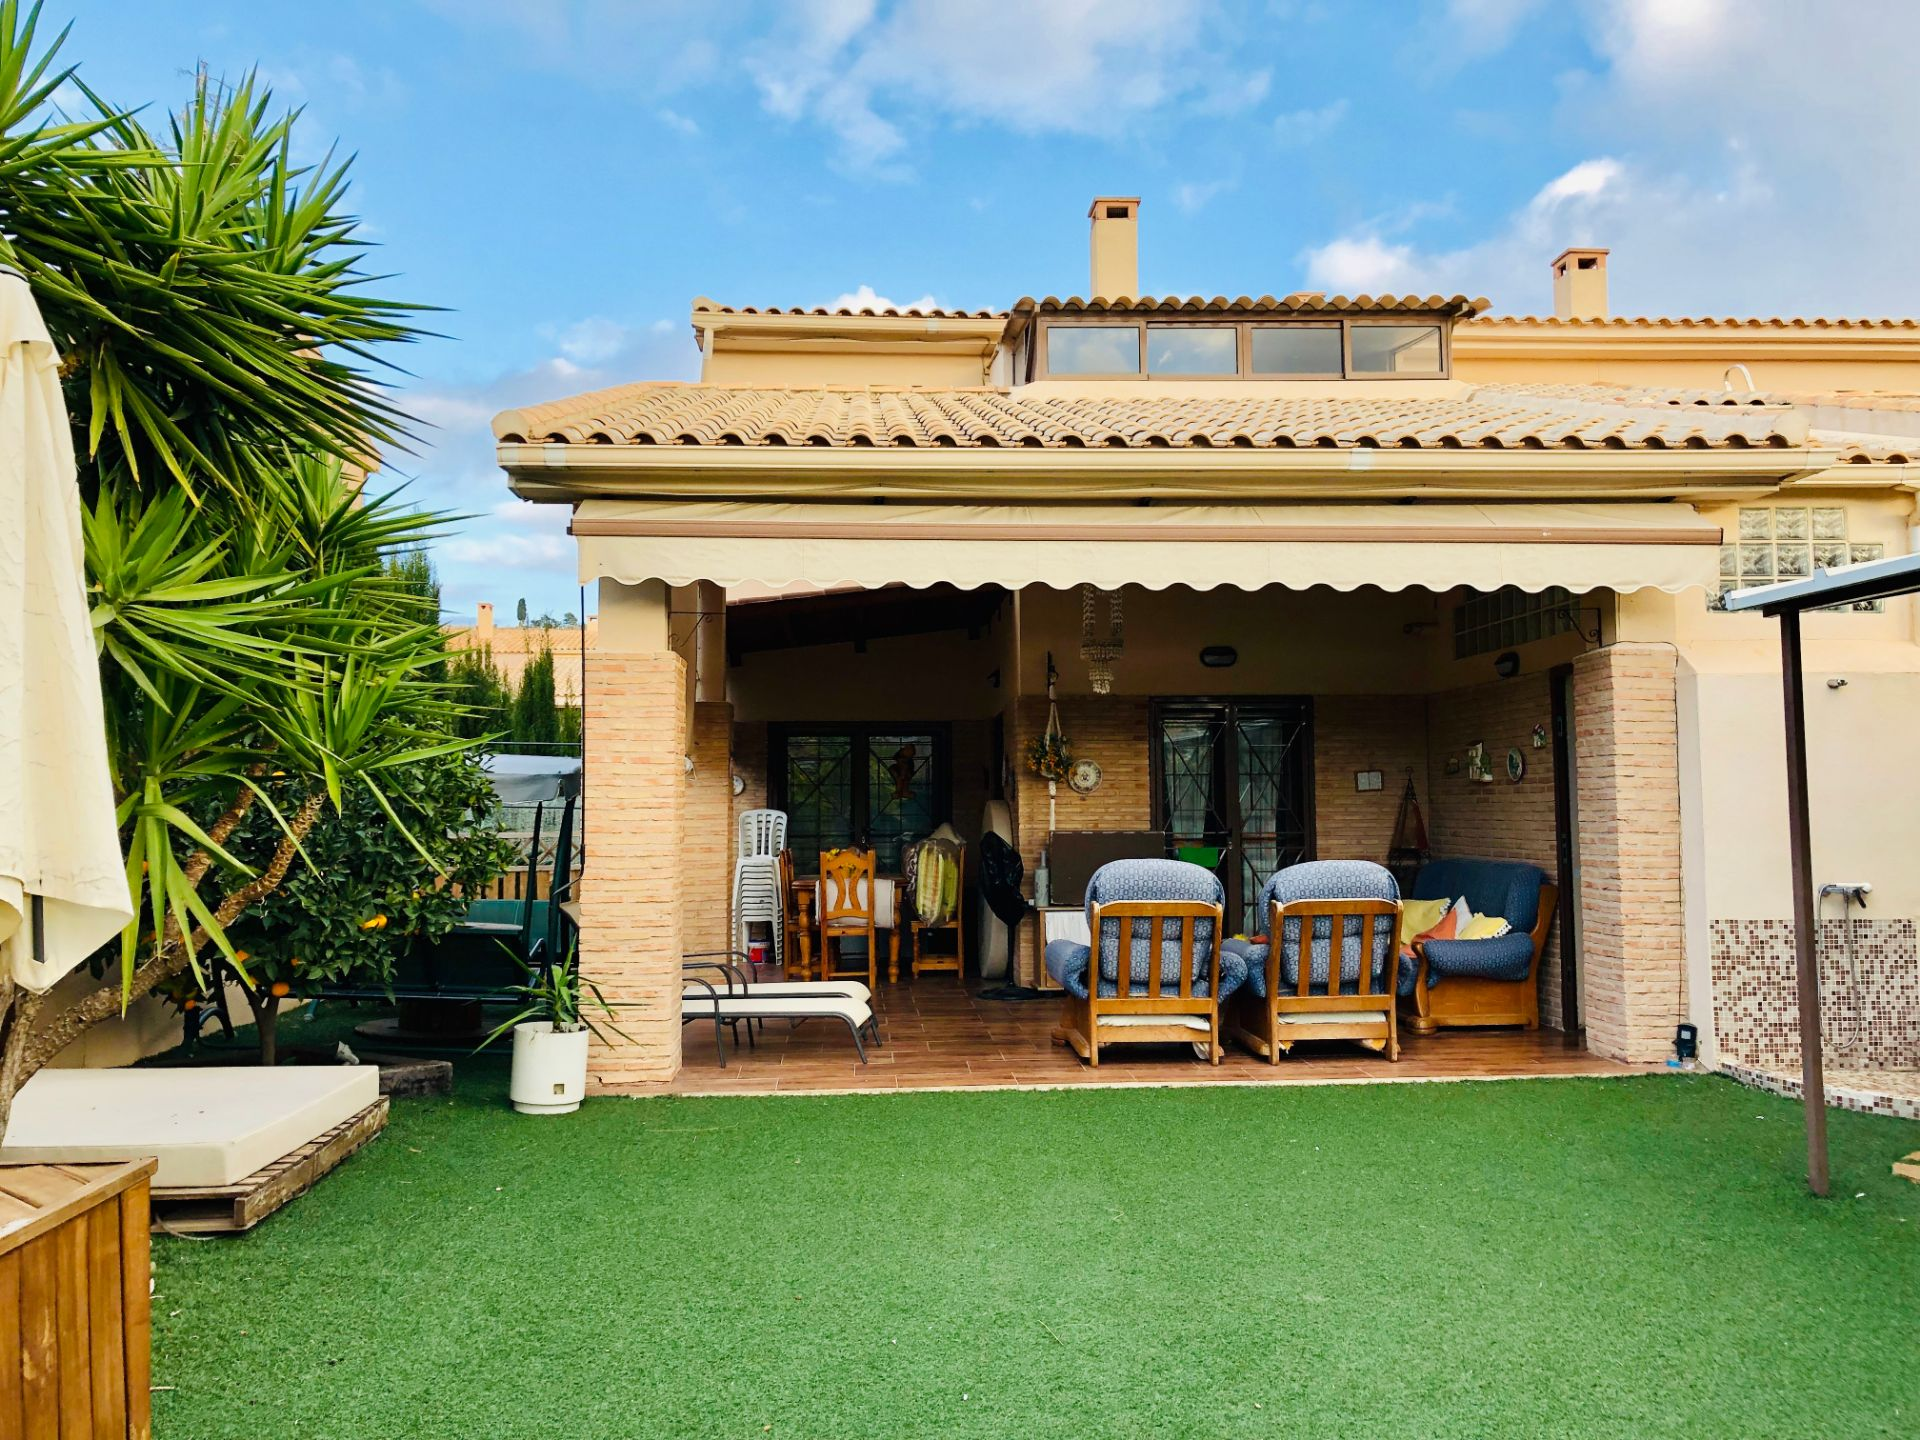 Casa adosada en Muchamiel, Ravel, venta